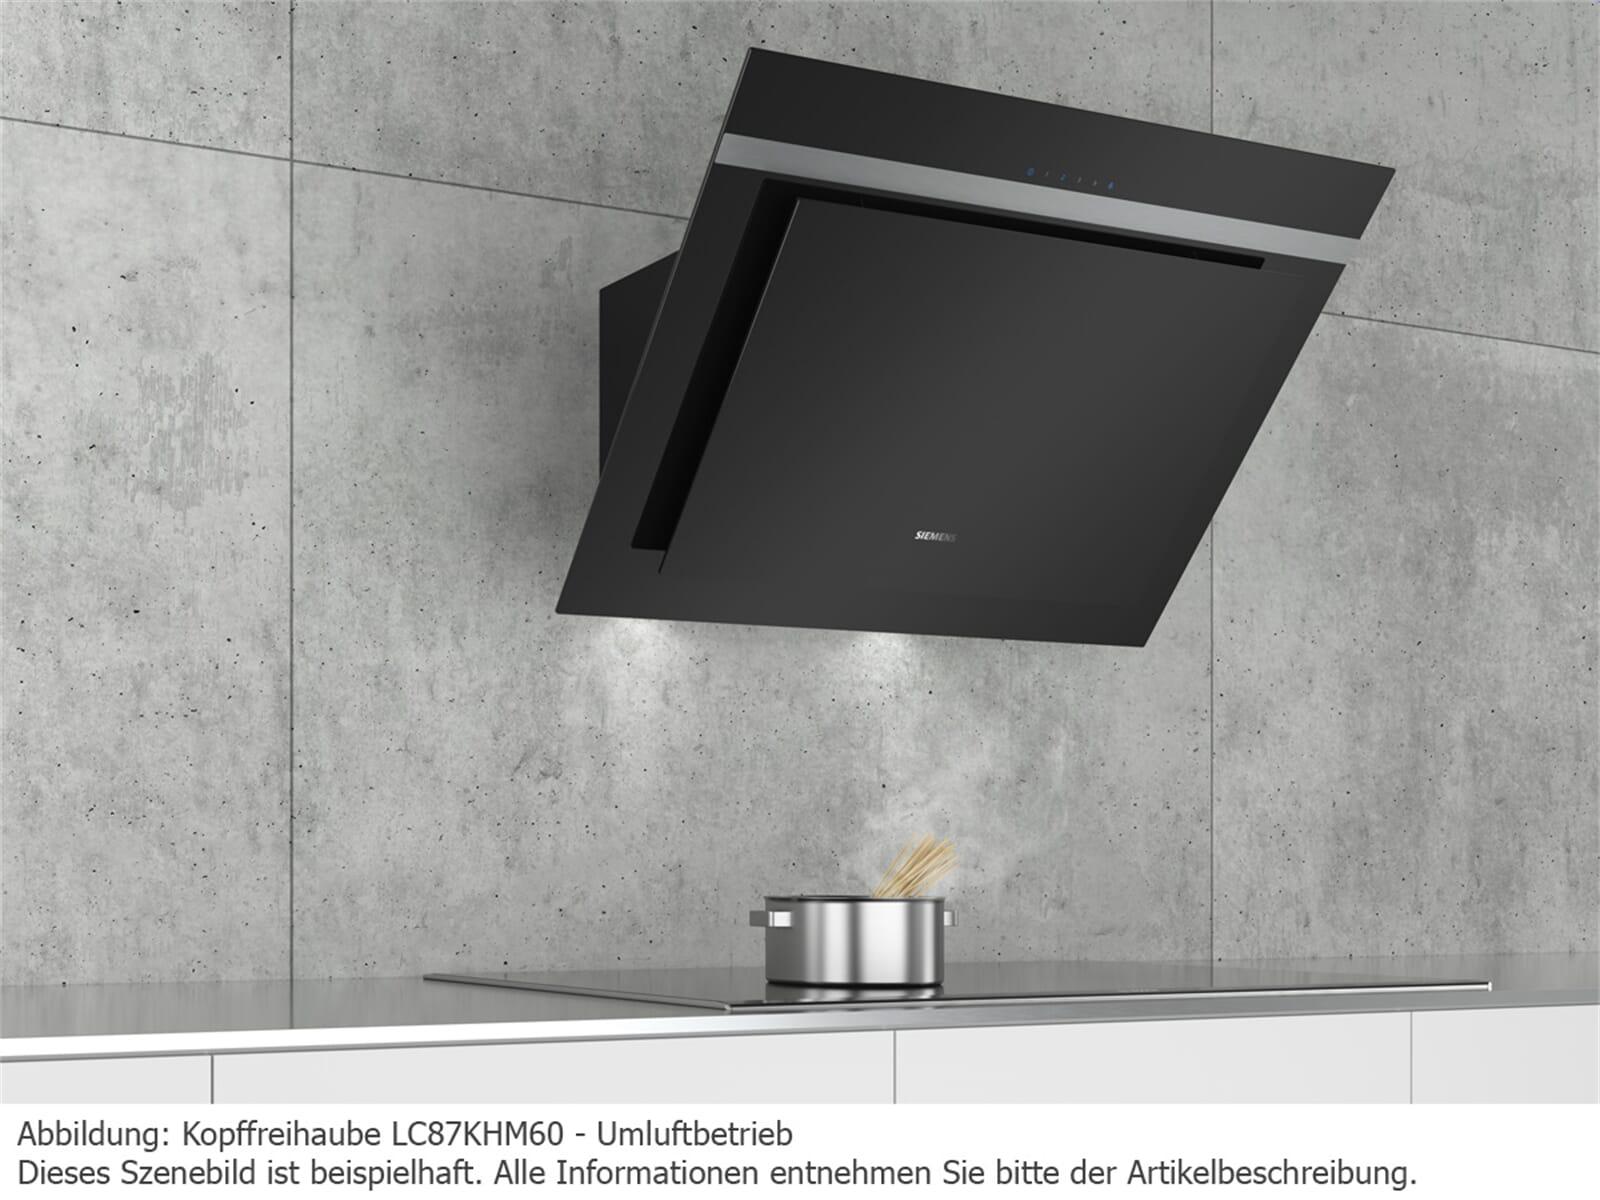 siemens lc87khm60 kopffreihaube schwarz. Black Bedroom Furniture Sets. Home Design Ideas